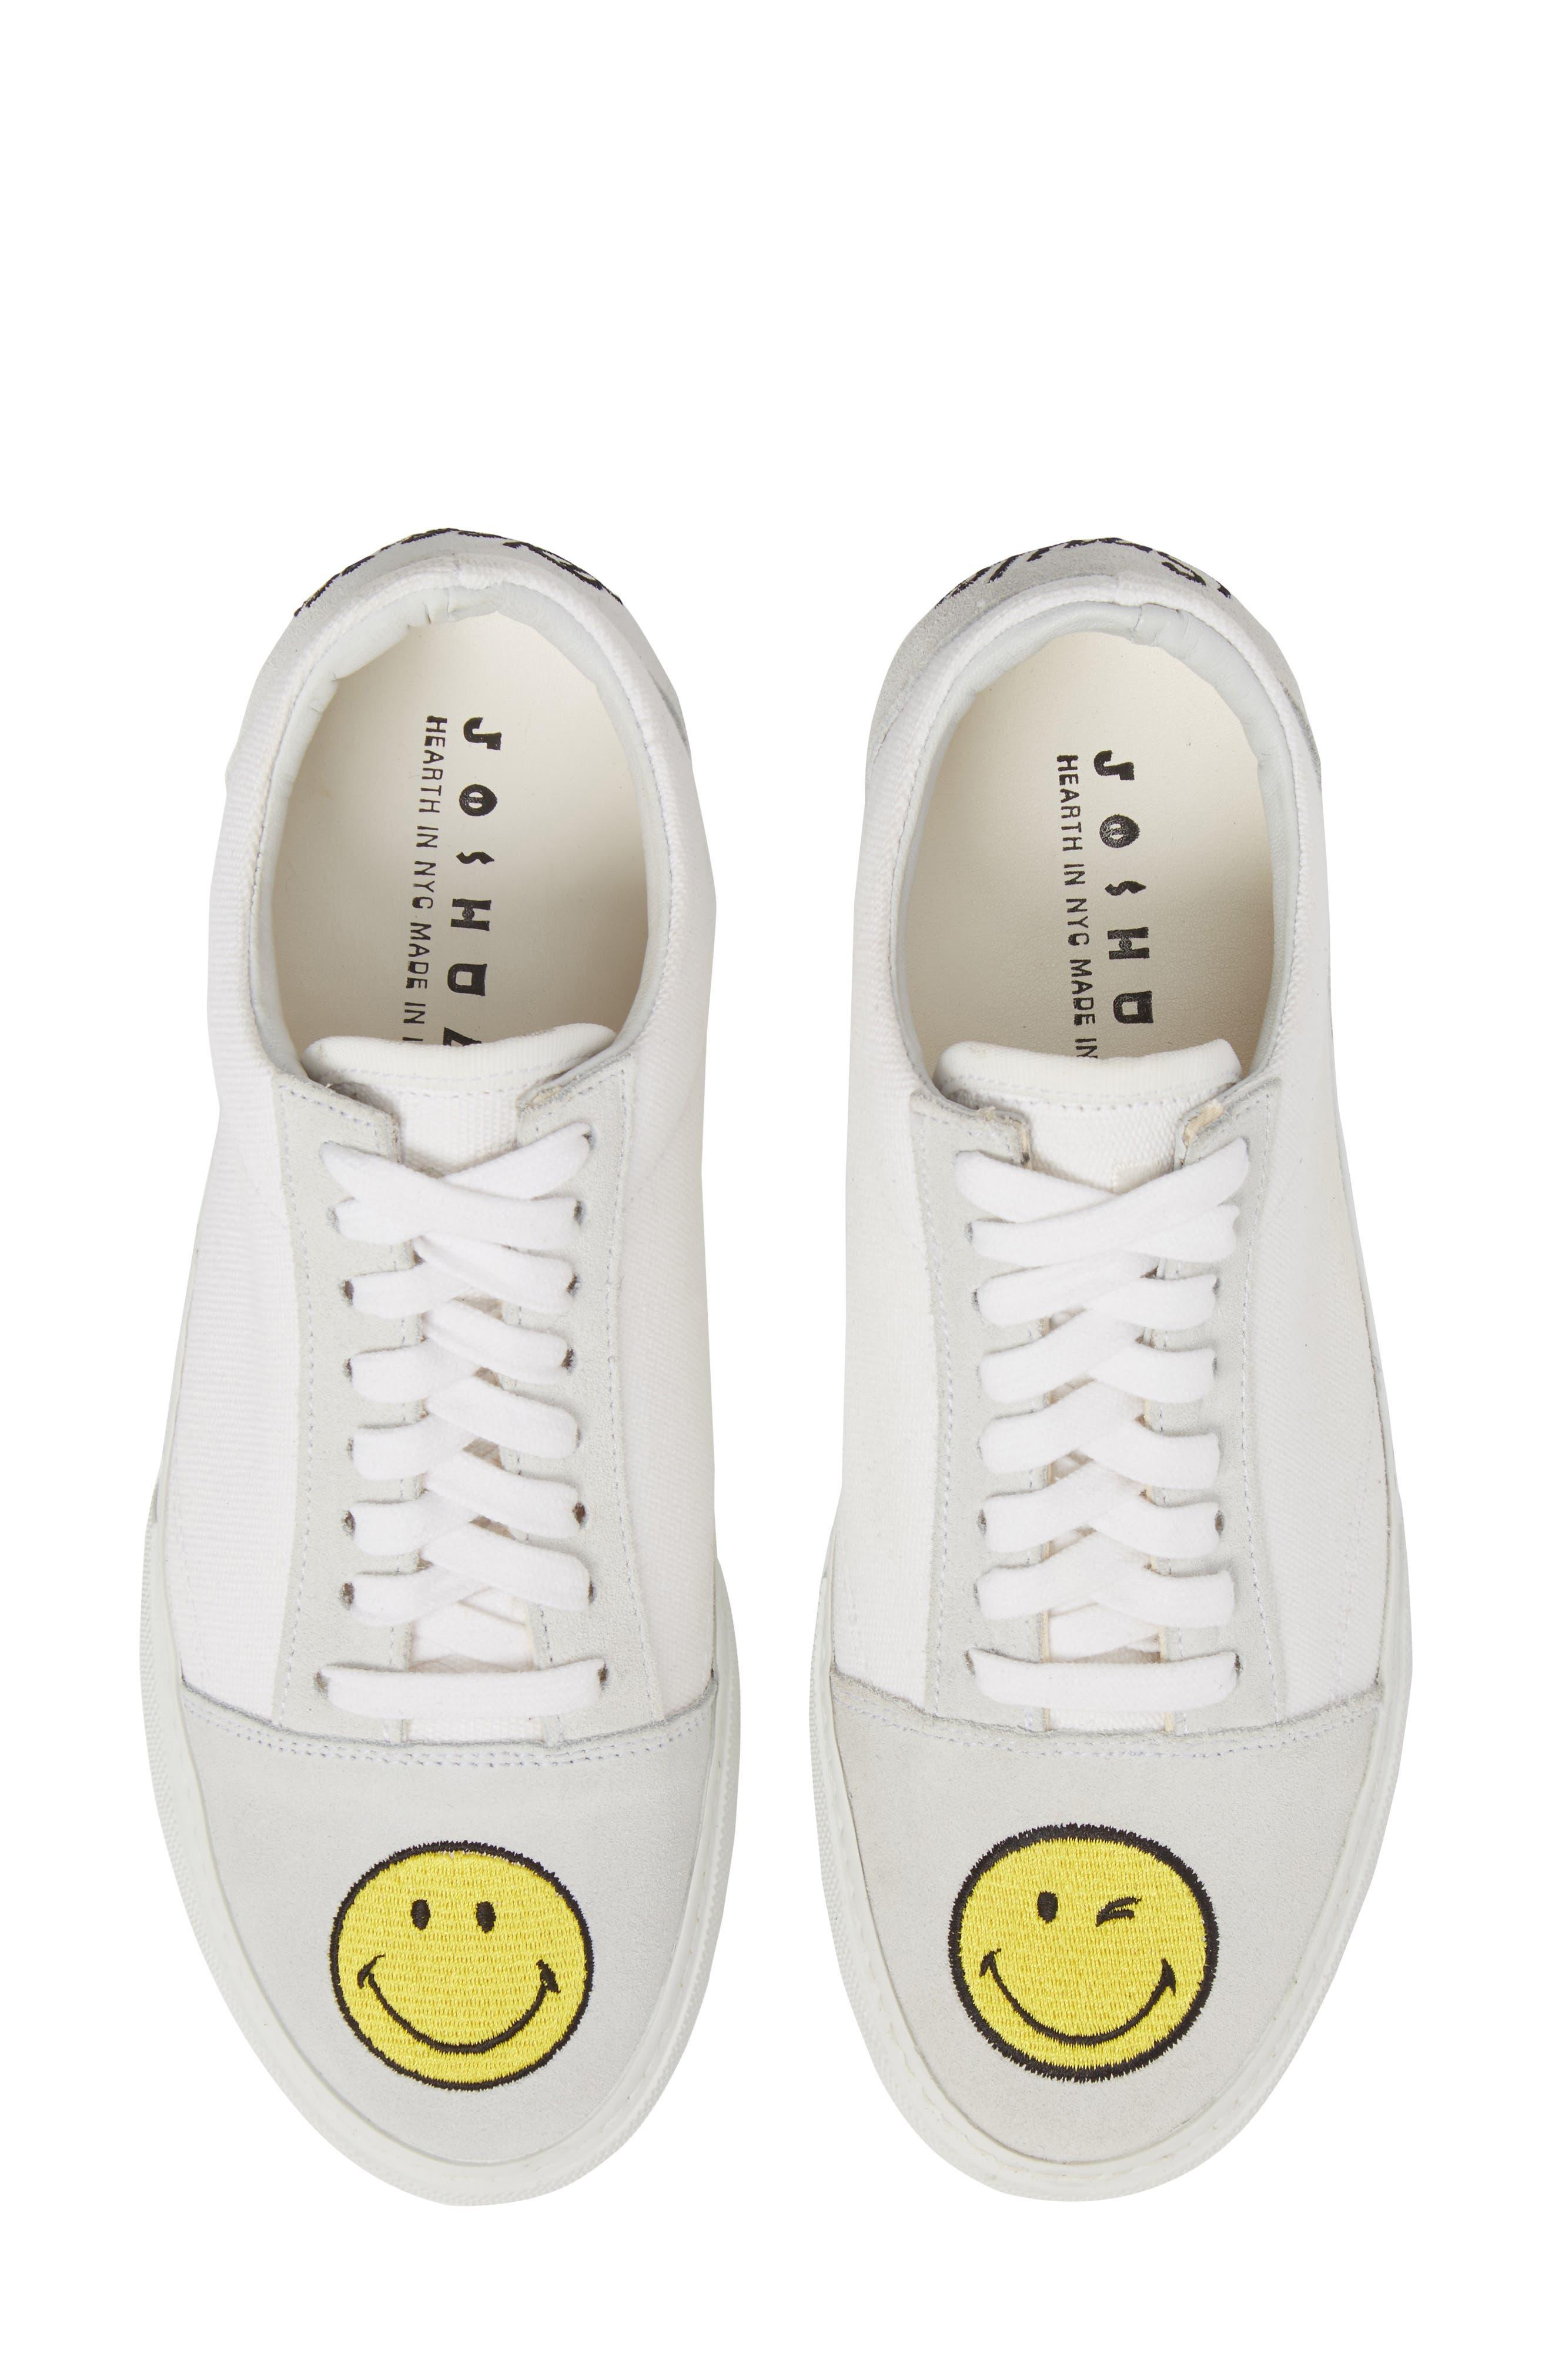 JOSHUA SANDERS Embroidered Smiley Sneaker (Women)